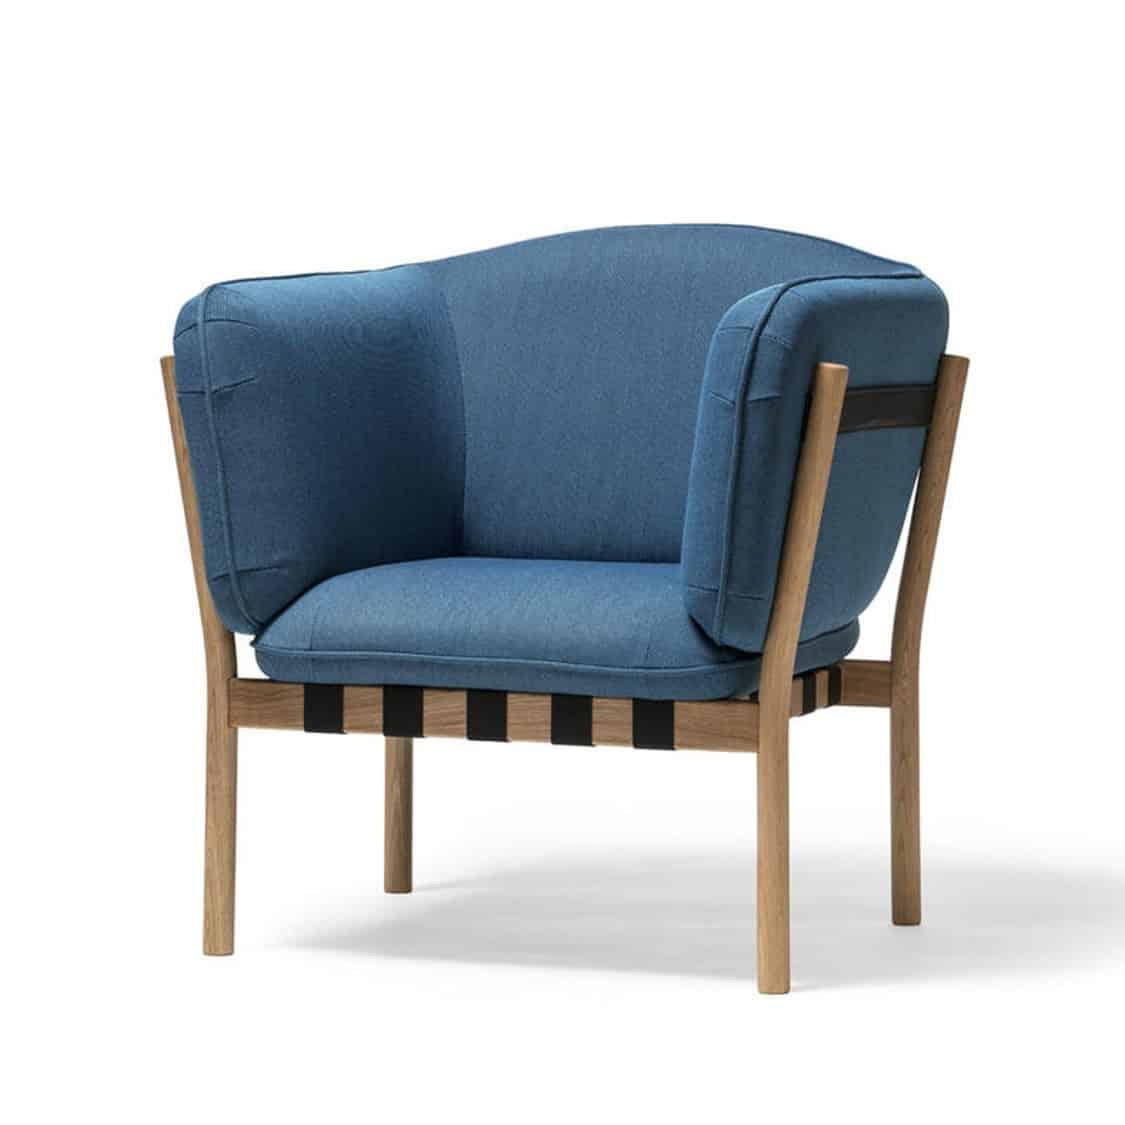 Dowel armchair DeFrae Contract Furniture Blue